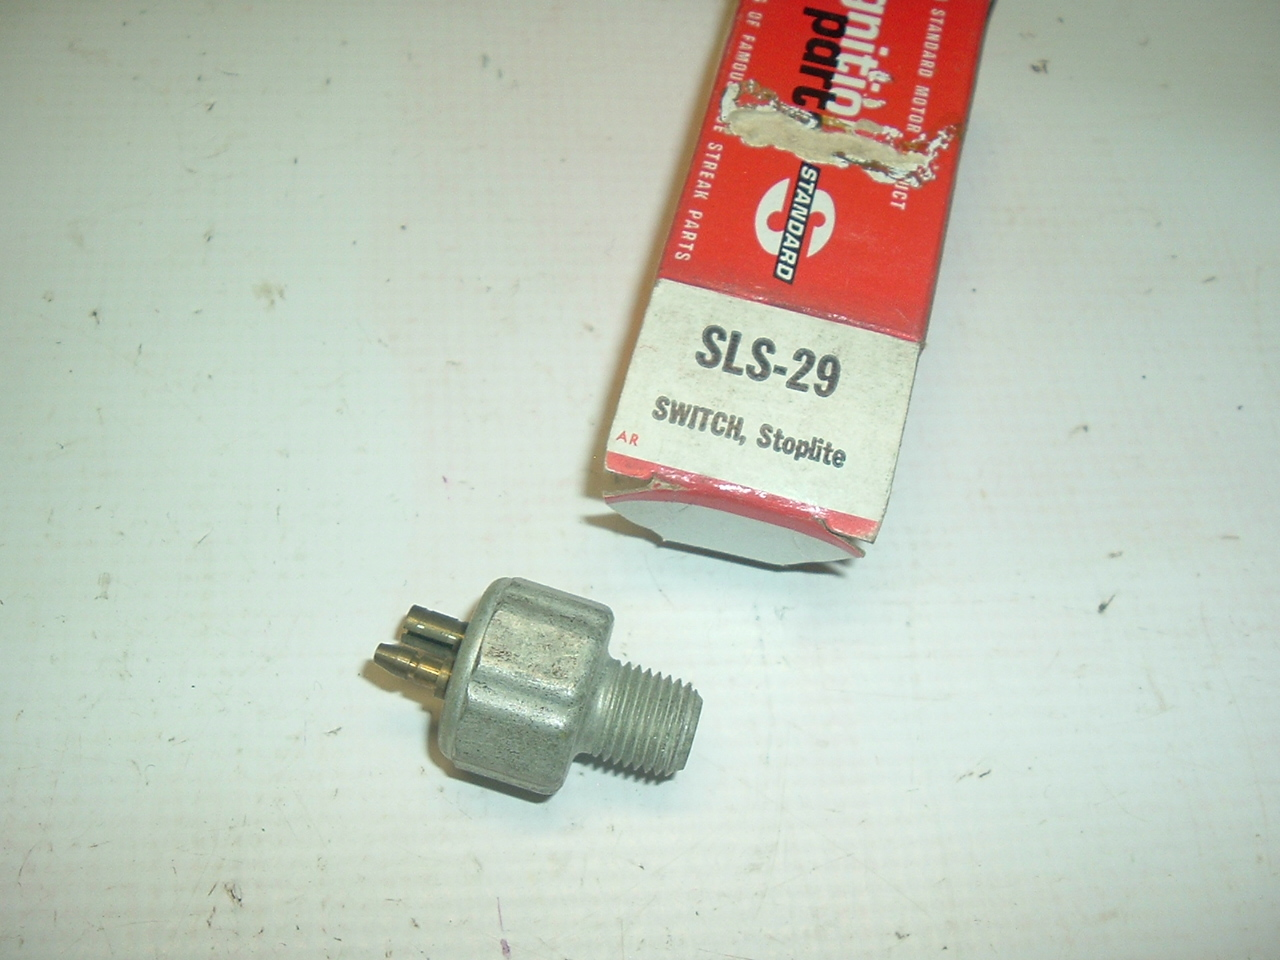 1955 56 57 58 59 60 61 Chrysler Desoto Dodge Plymouth Hydraulic brake switch ( a sls29)